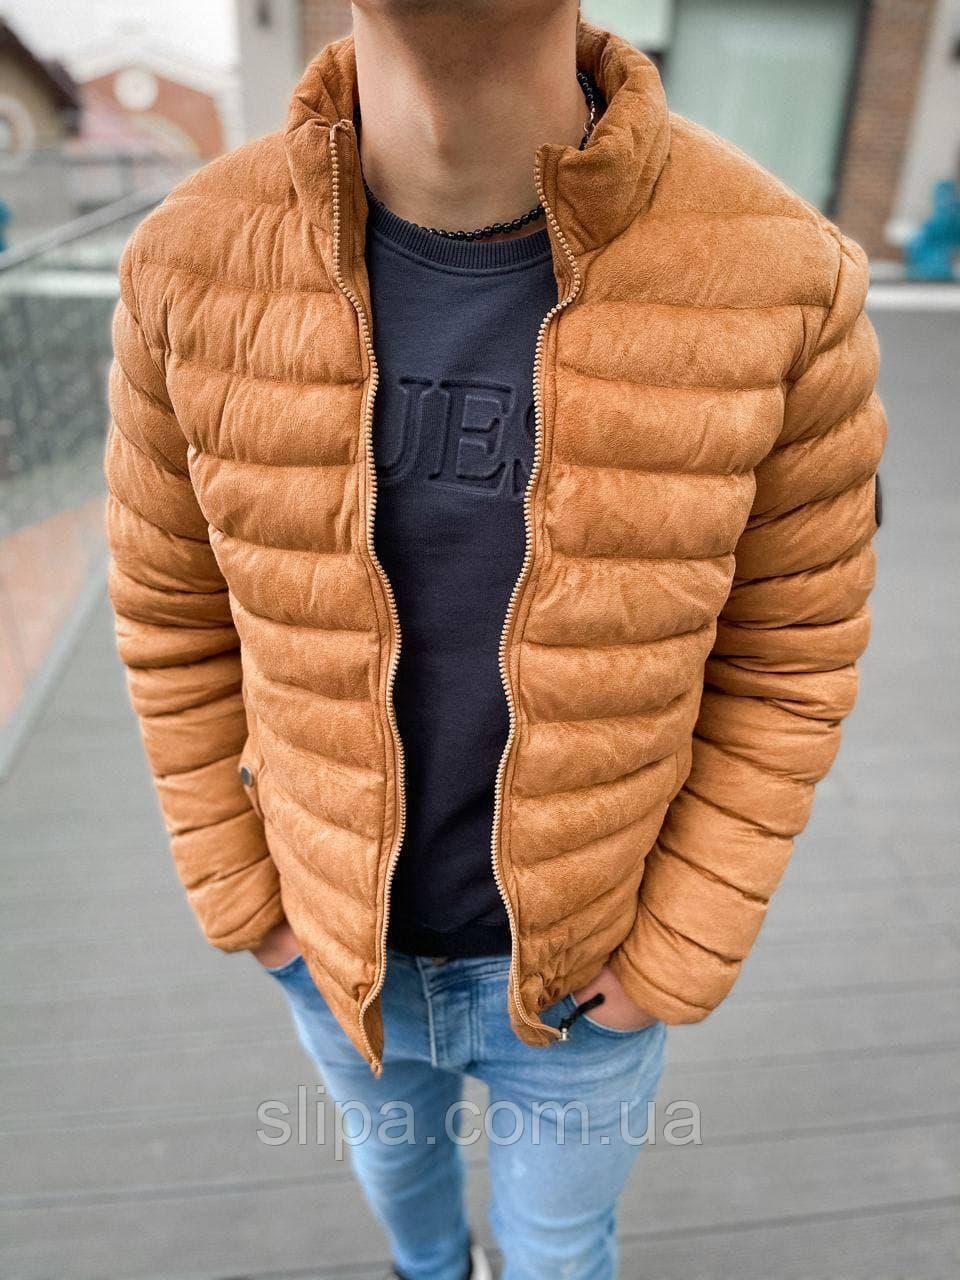 Чоловіча стильна куртка без капюшона коричнева